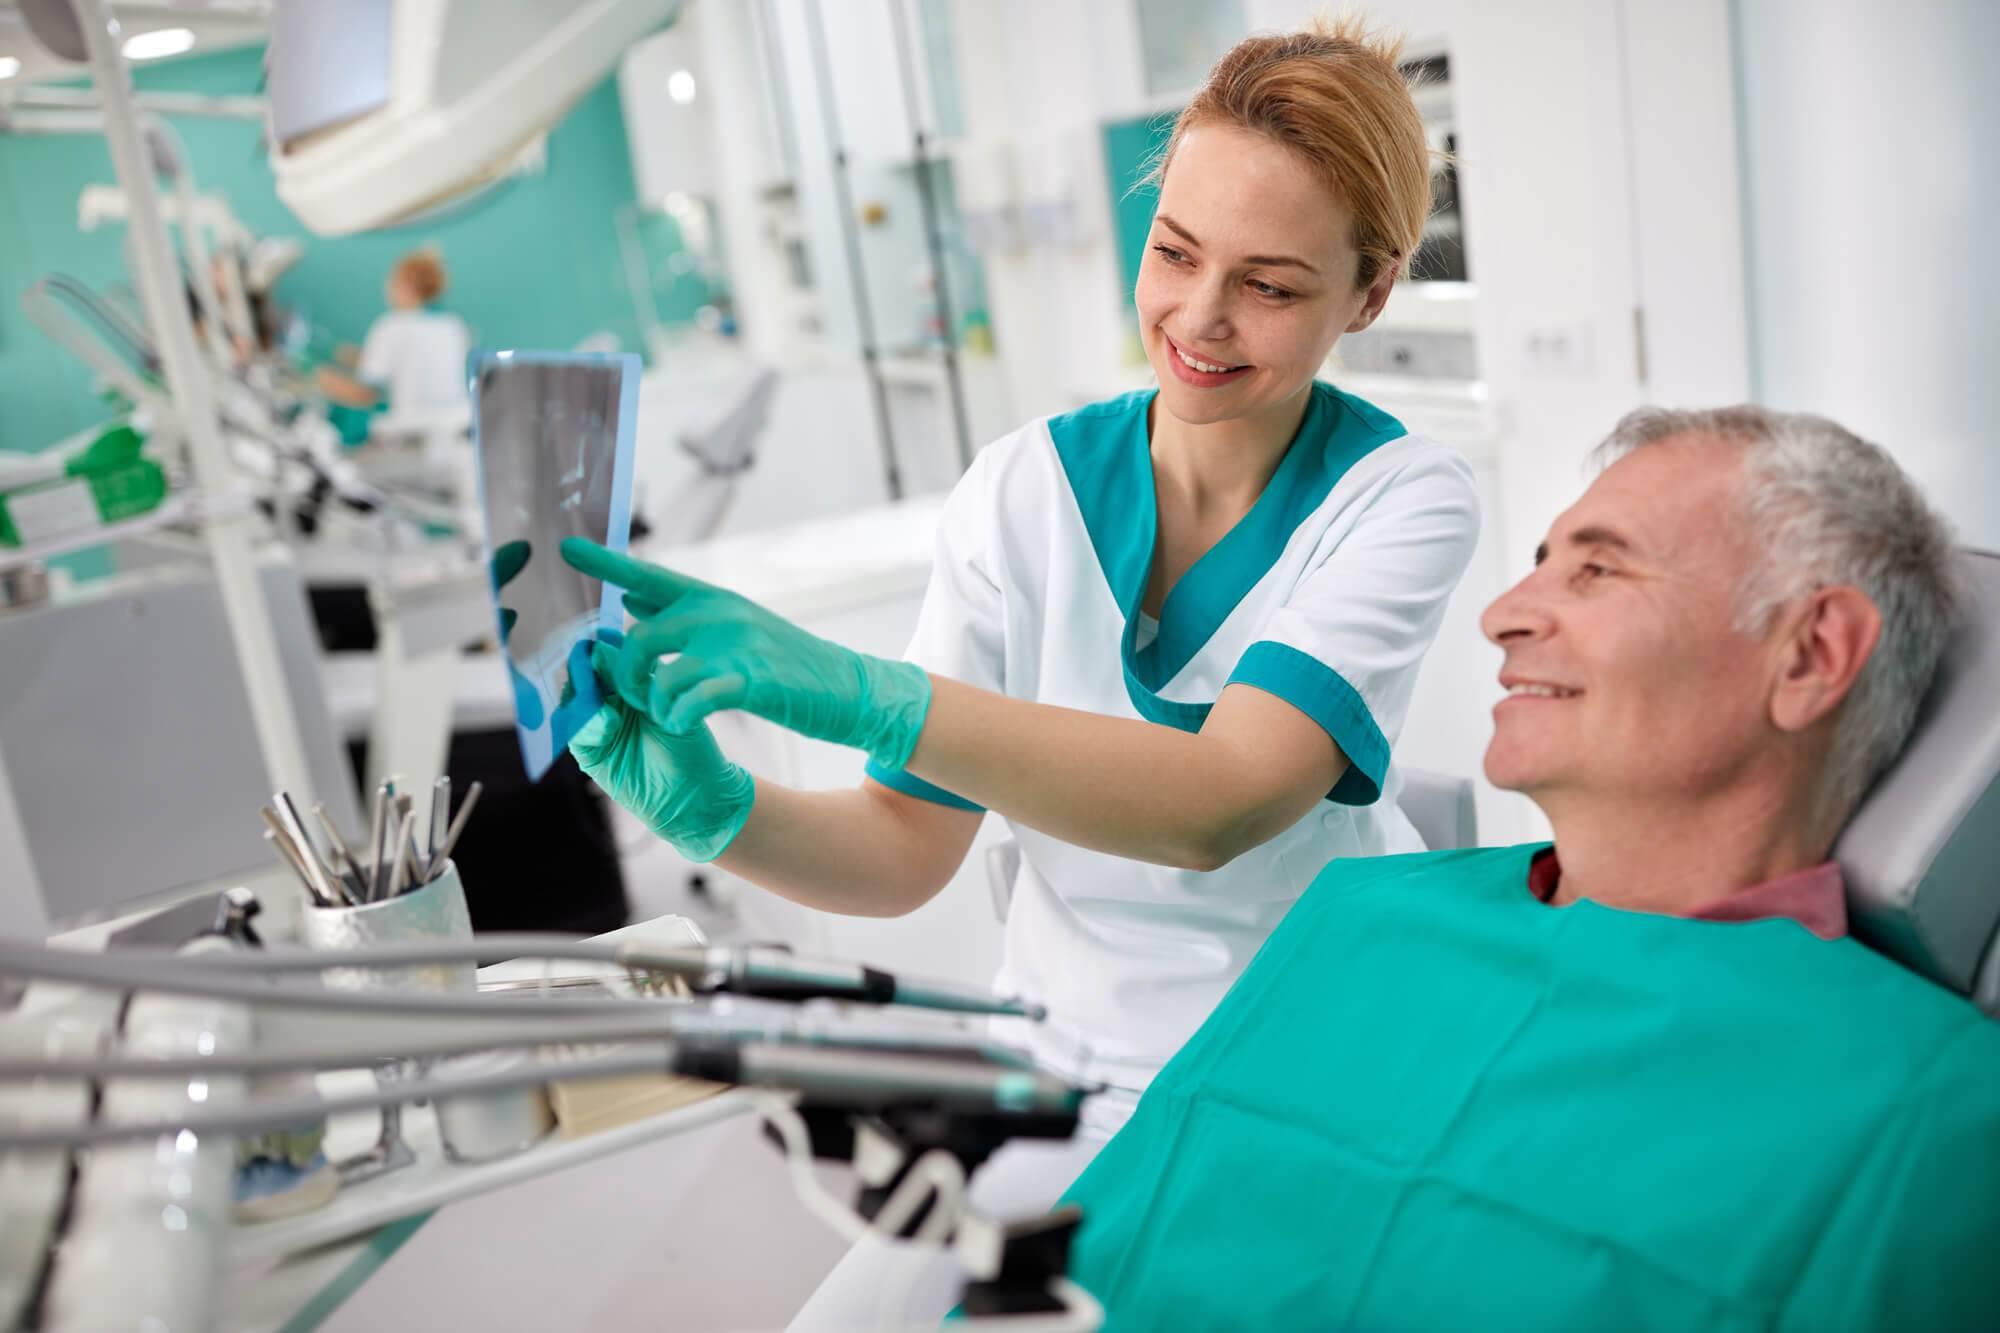 Check-up médico: por que incluir a visita ao dentista na lista?